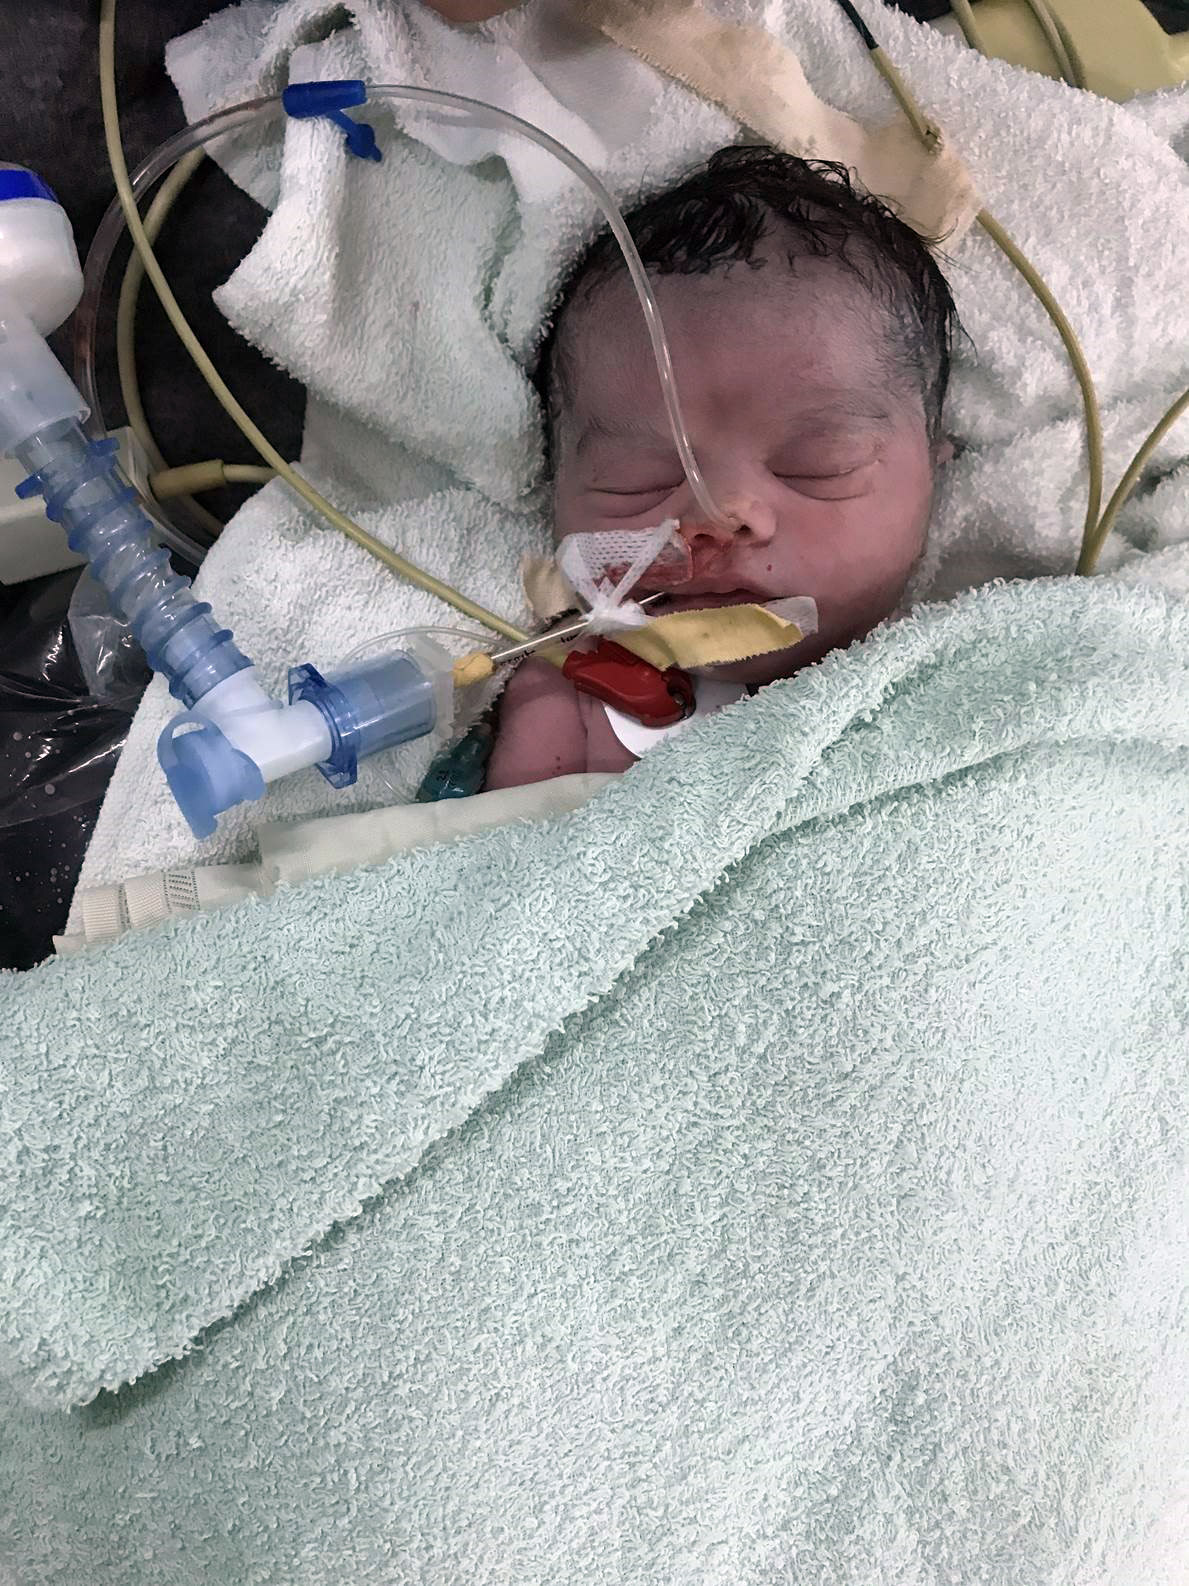 Sarah intubata nel Centro chirurgico di Lashkar-gah in Afghanistan